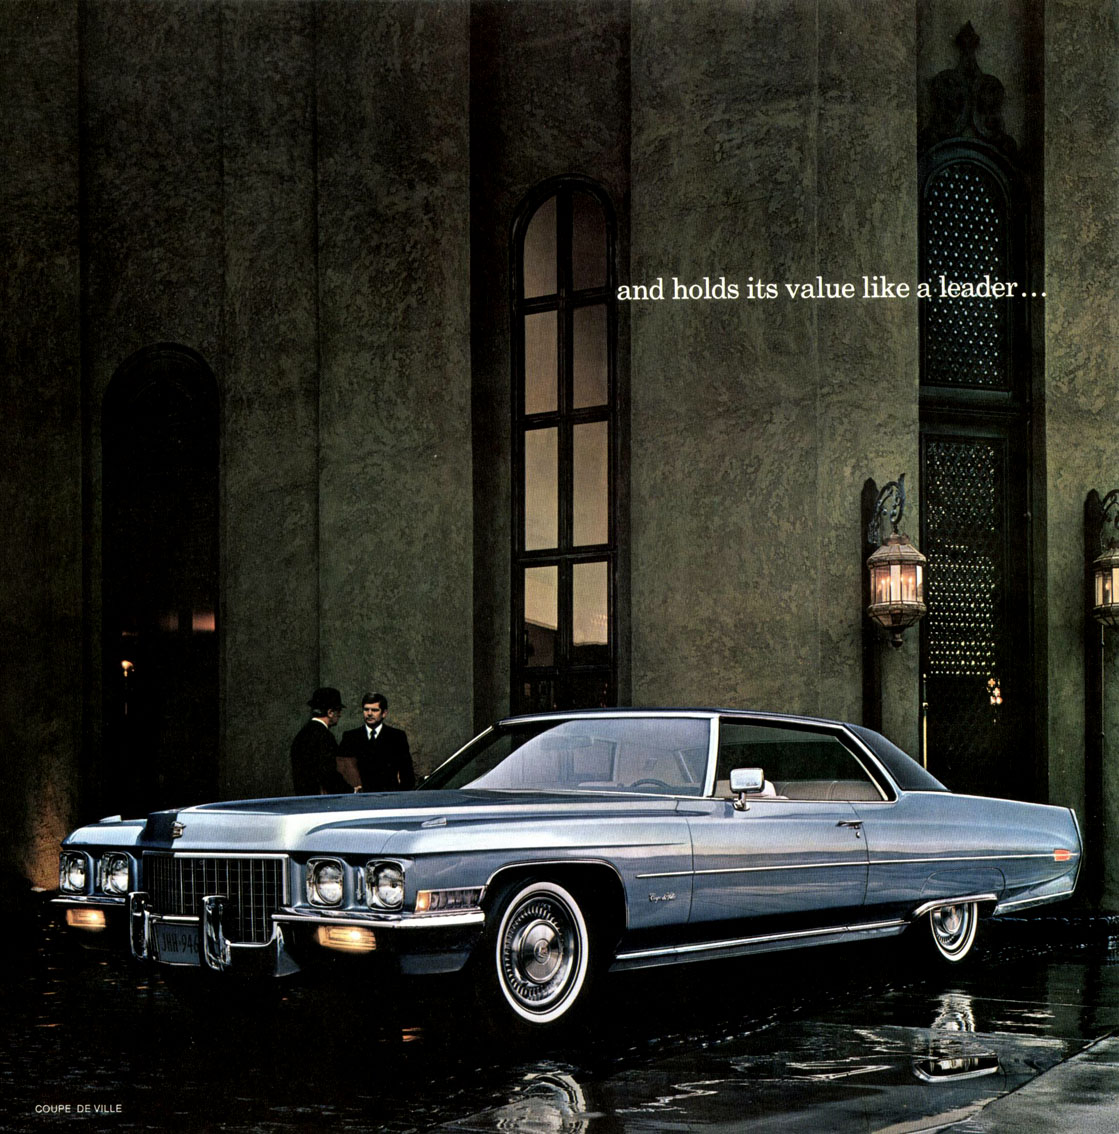 1971 Cadillac Looks Like A Leader Mailer